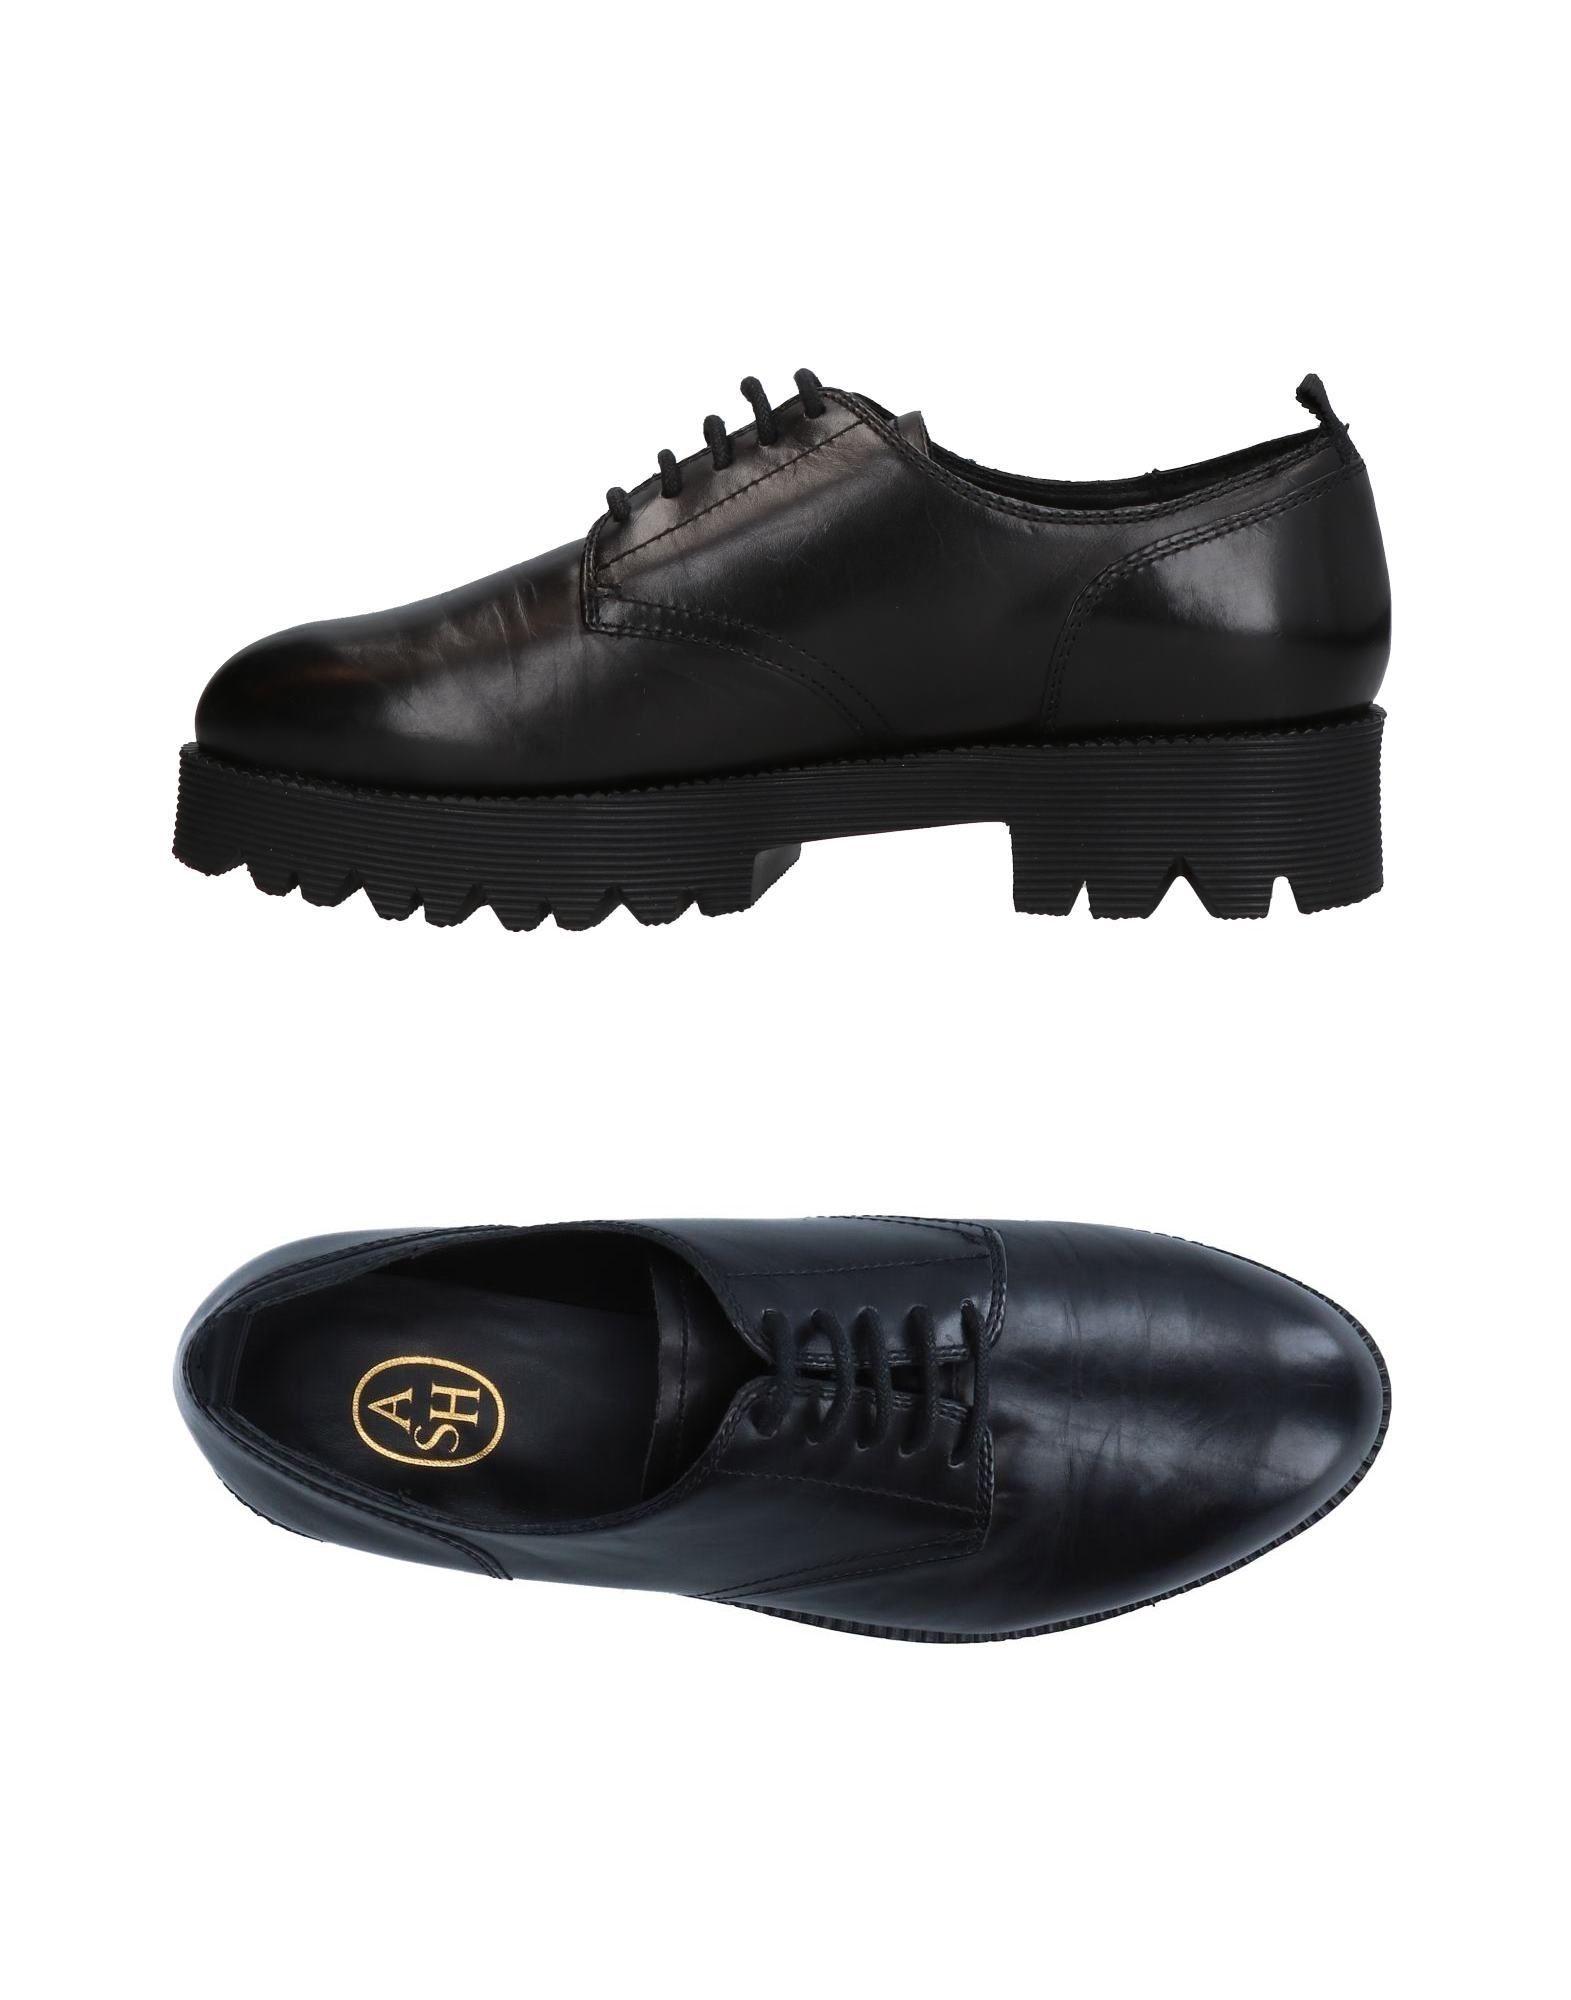 Ash Schnürschuhe Schuhe Damen  11316293LL Heiße Schuhe Schnürschuhe 2e3f3b